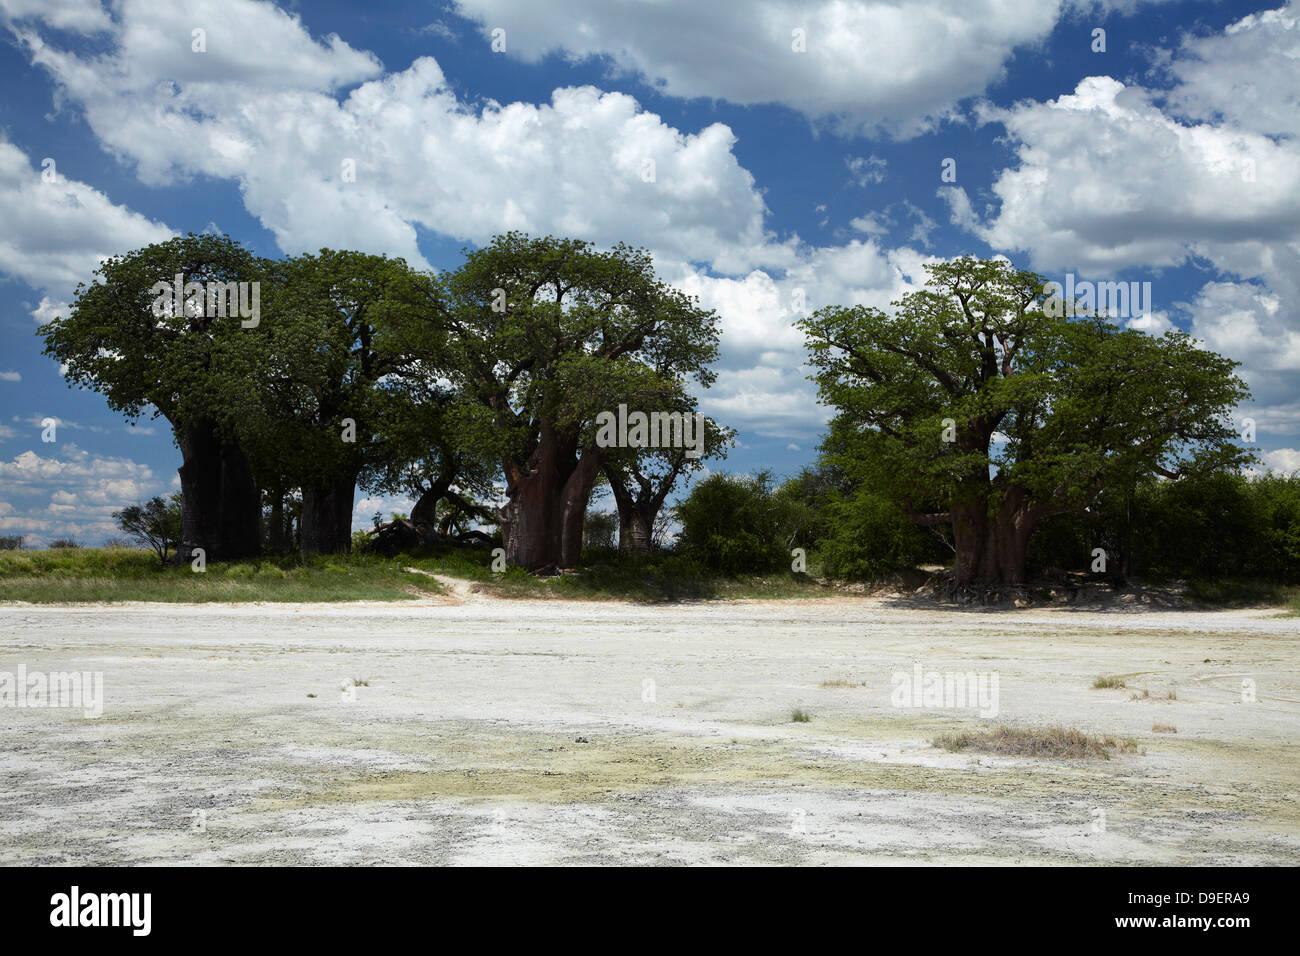 Baines' Baobabs, Kudiakam Pan, Nxai Pan National Park, Botswana, Africa - Stock Image